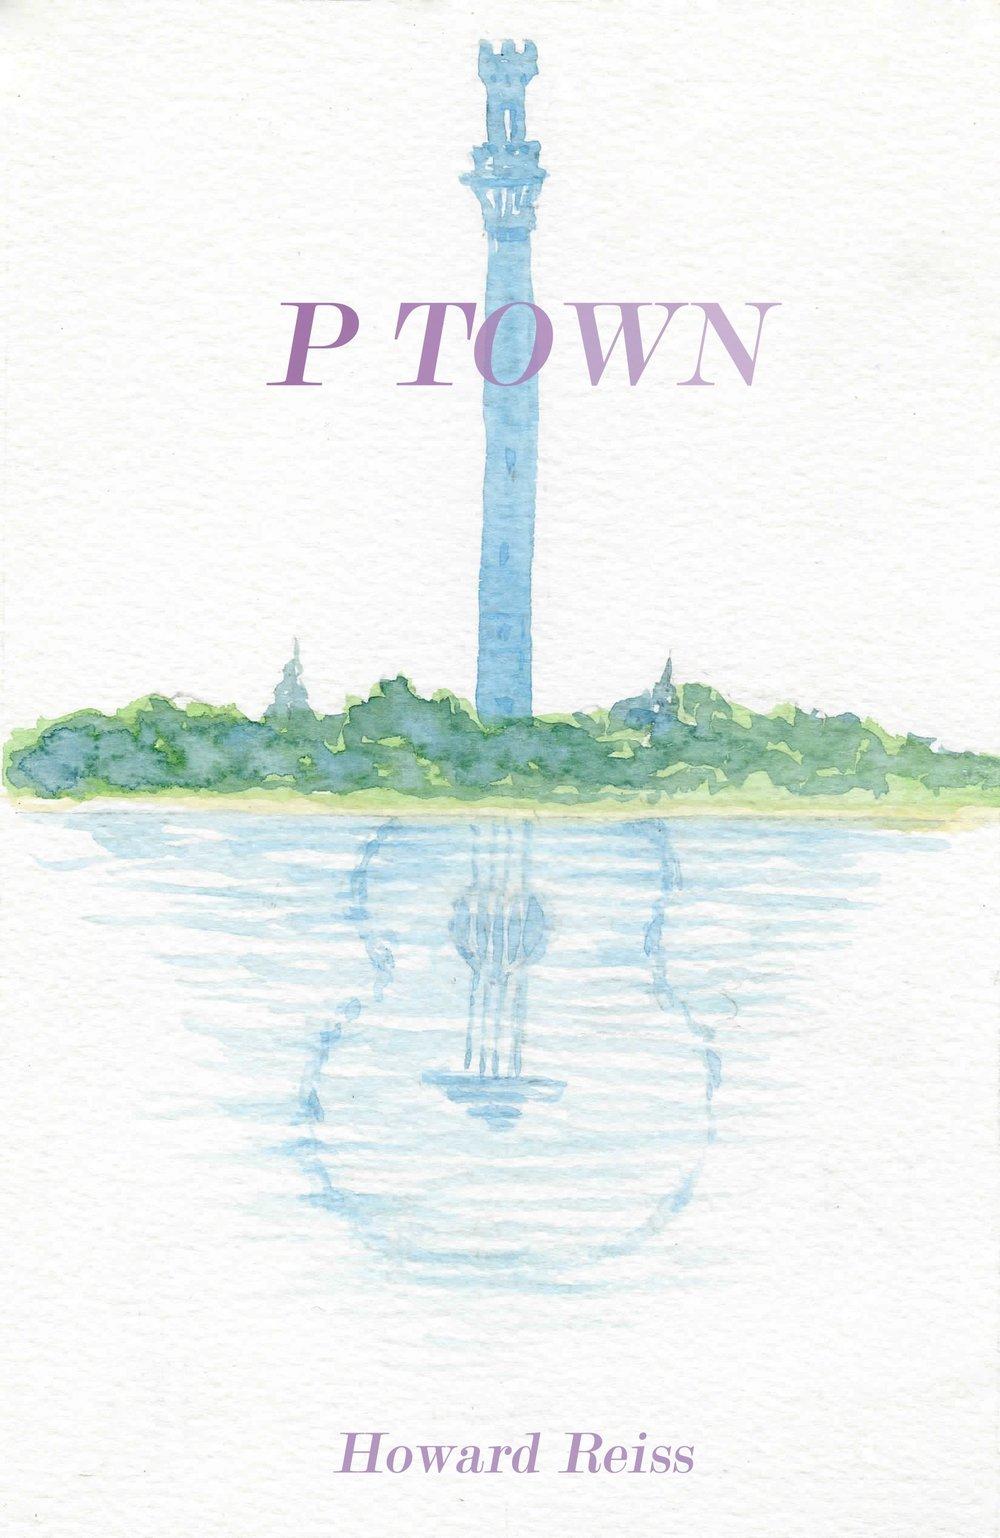 ptownfinalcover.jpg